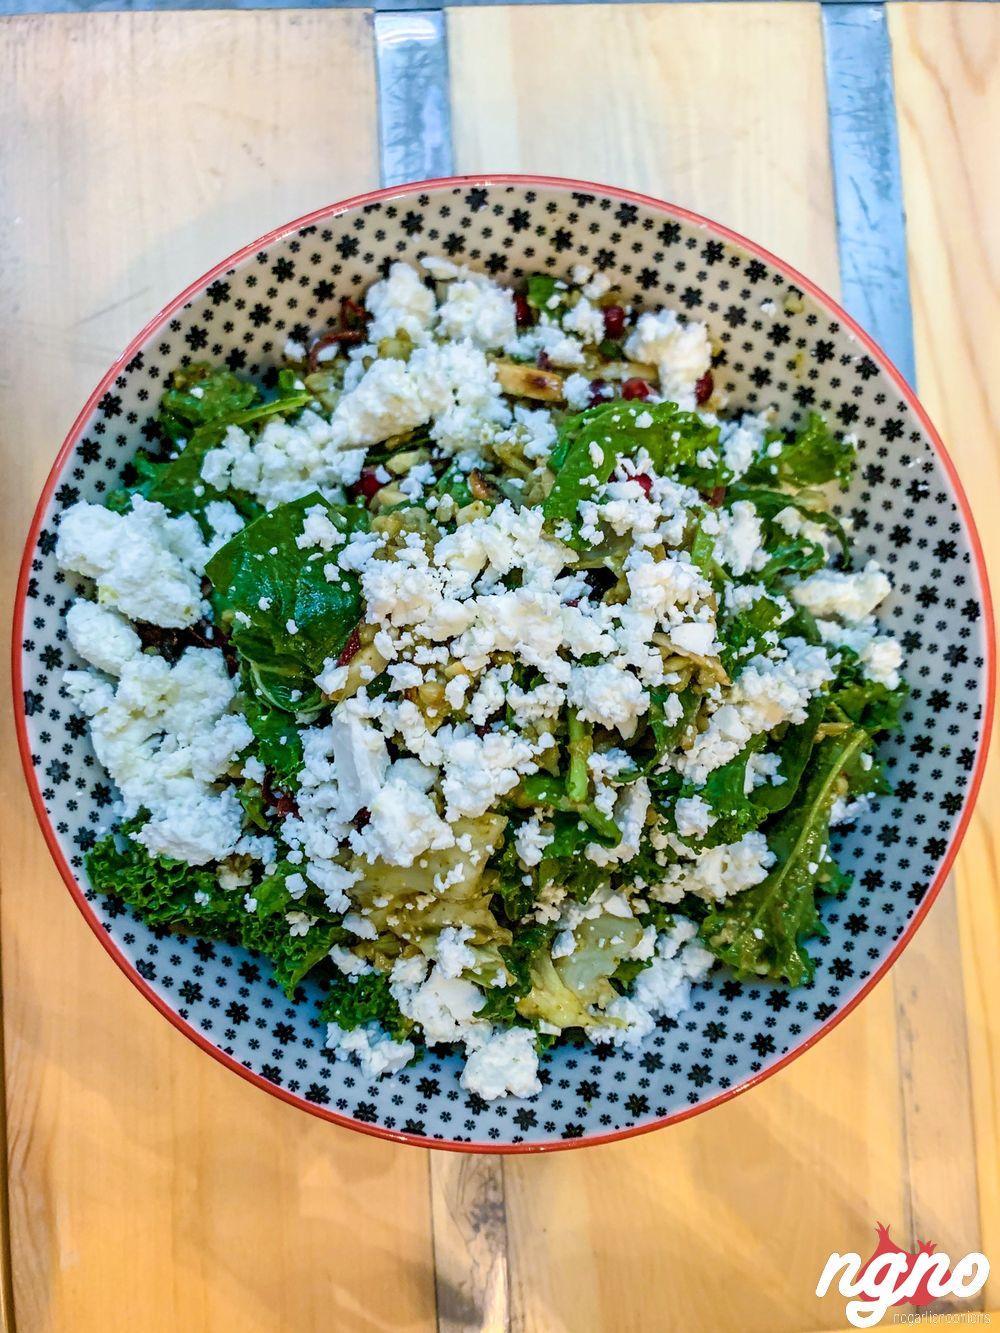 salata-eatery-beirut-nogarlicnoonions-42019-02-22-12-49-25